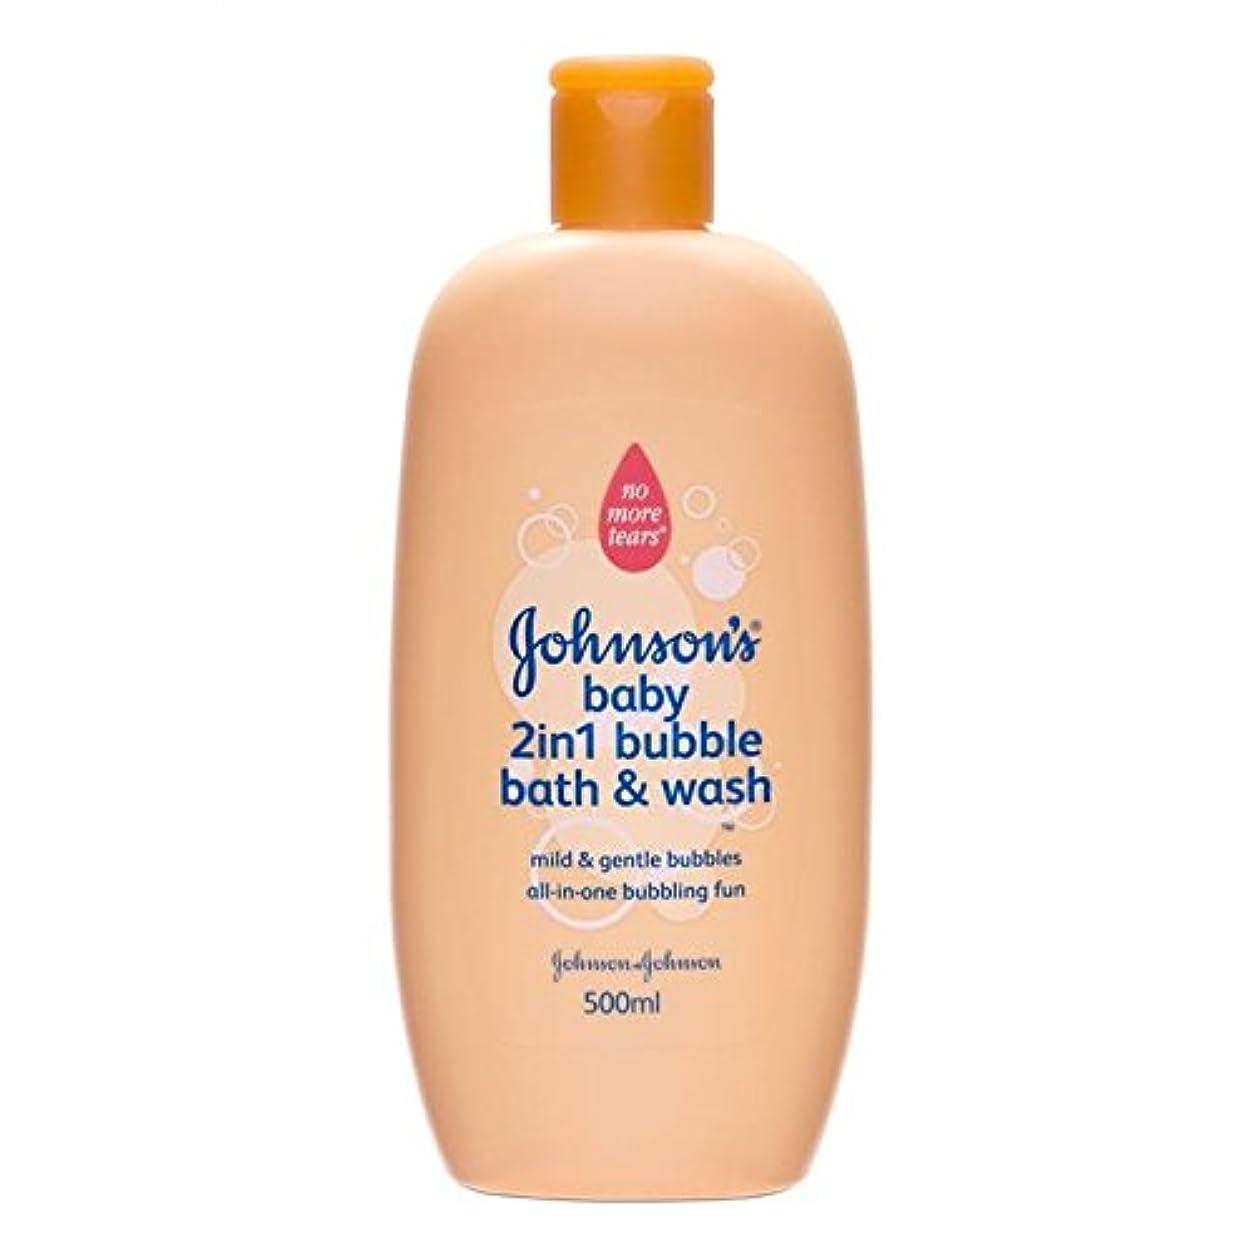 Johnsons Baby 2-in-1 Bubble Bath & Wash 500ml by Johnson'